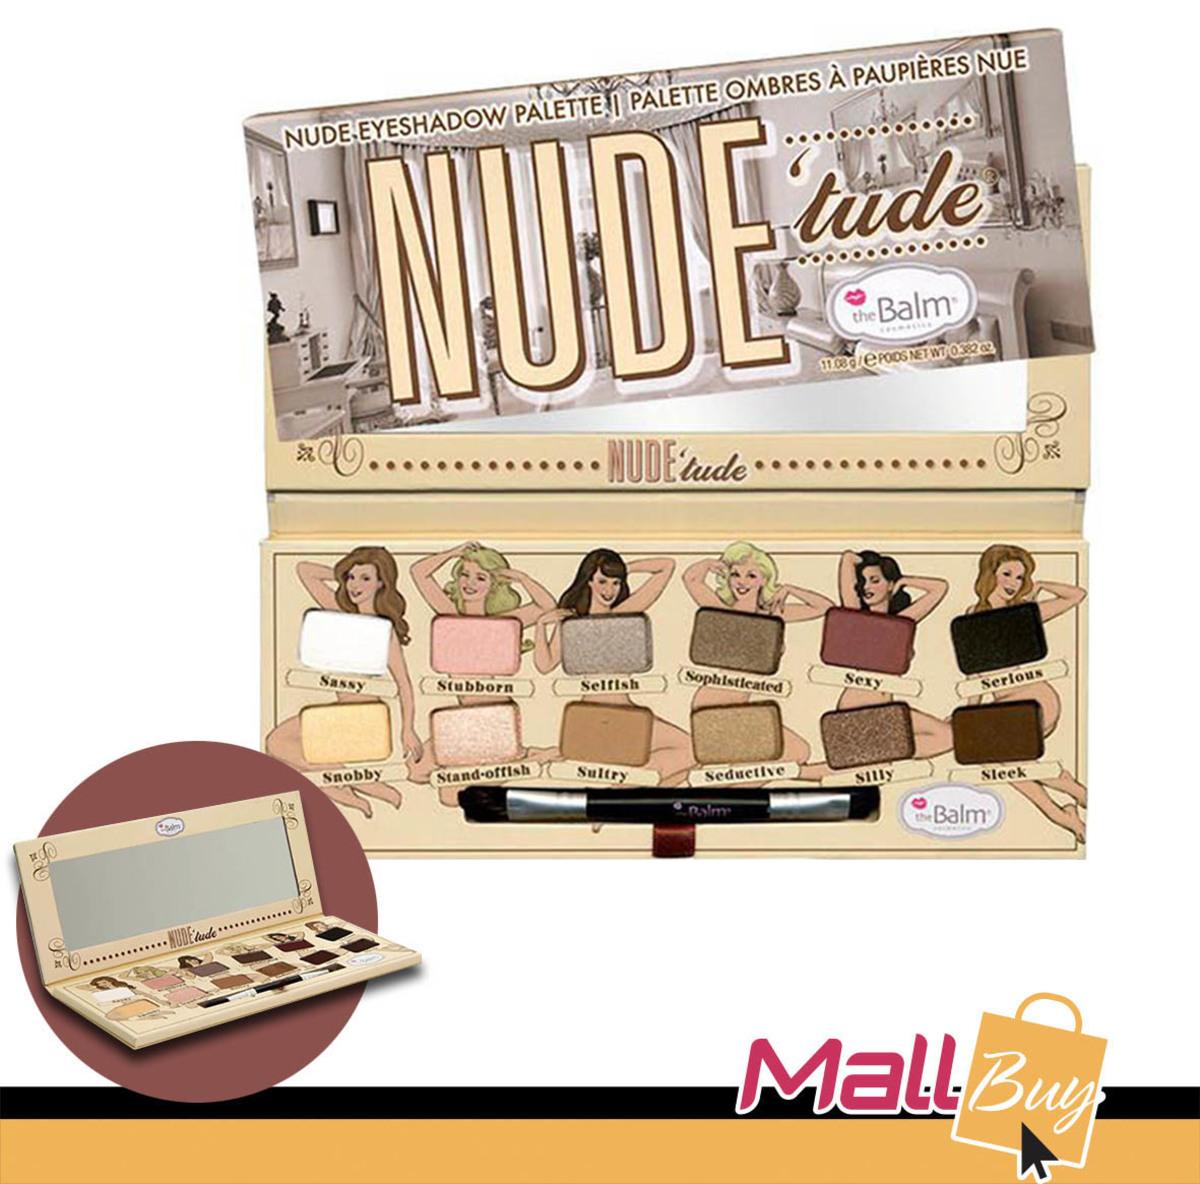 Nude Tude Eyeshadow Palette-裸色眼影彩妝組合